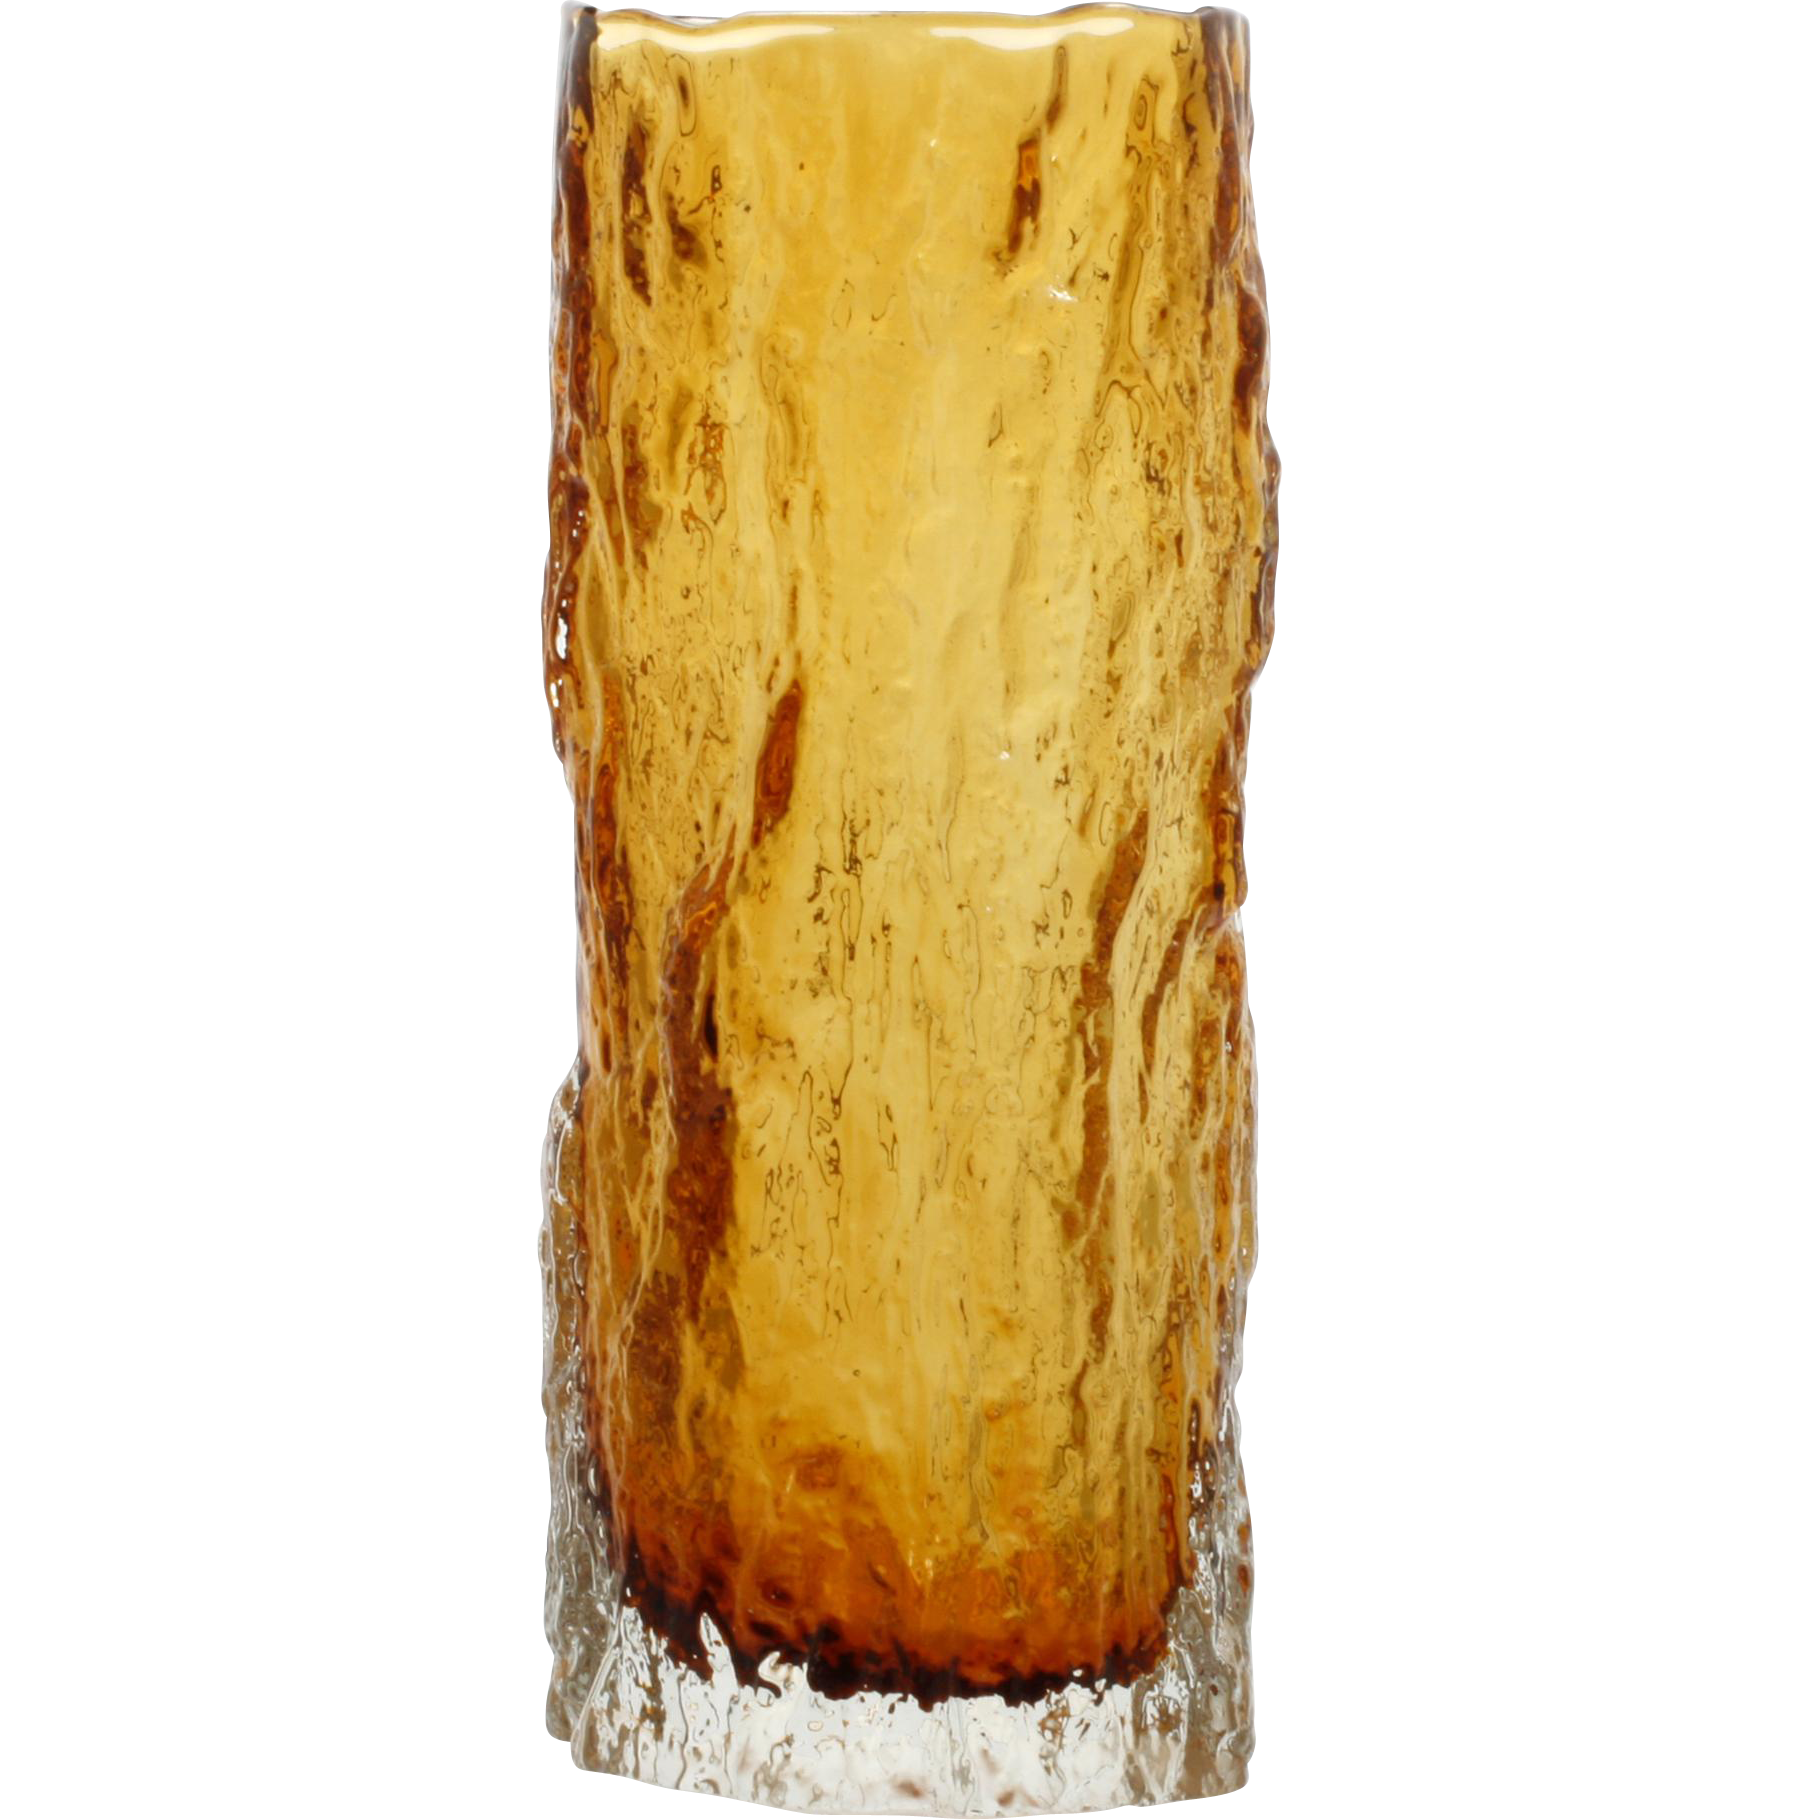 Vintage Amber Bark Art Glass Vase Textured Cased Glass Mid Century Modern